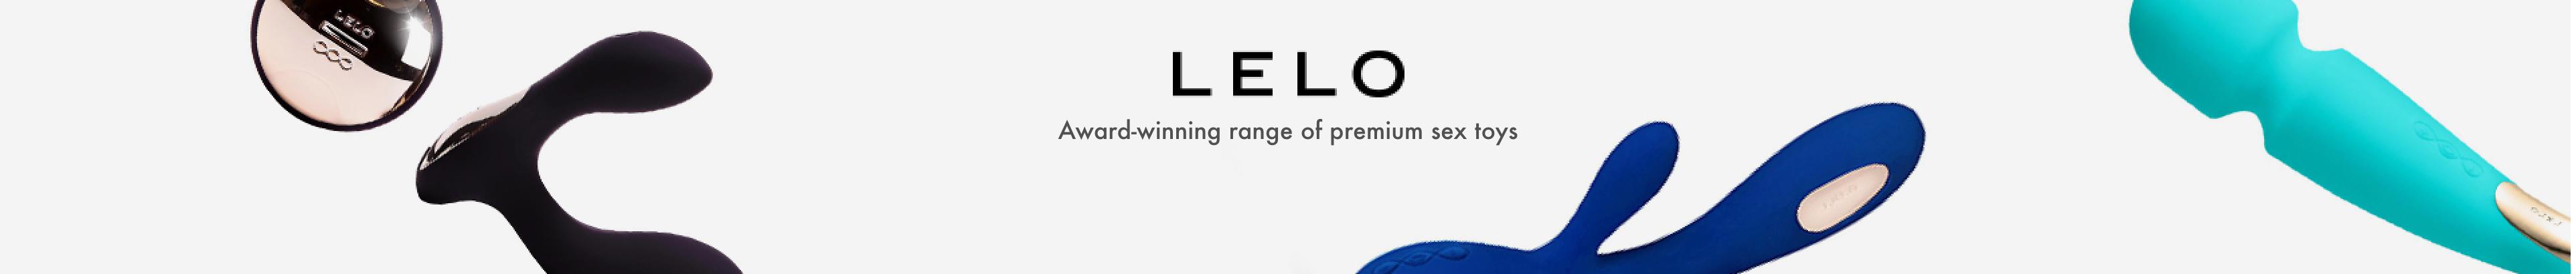 Lelo - Award-winning range of premium sex toys